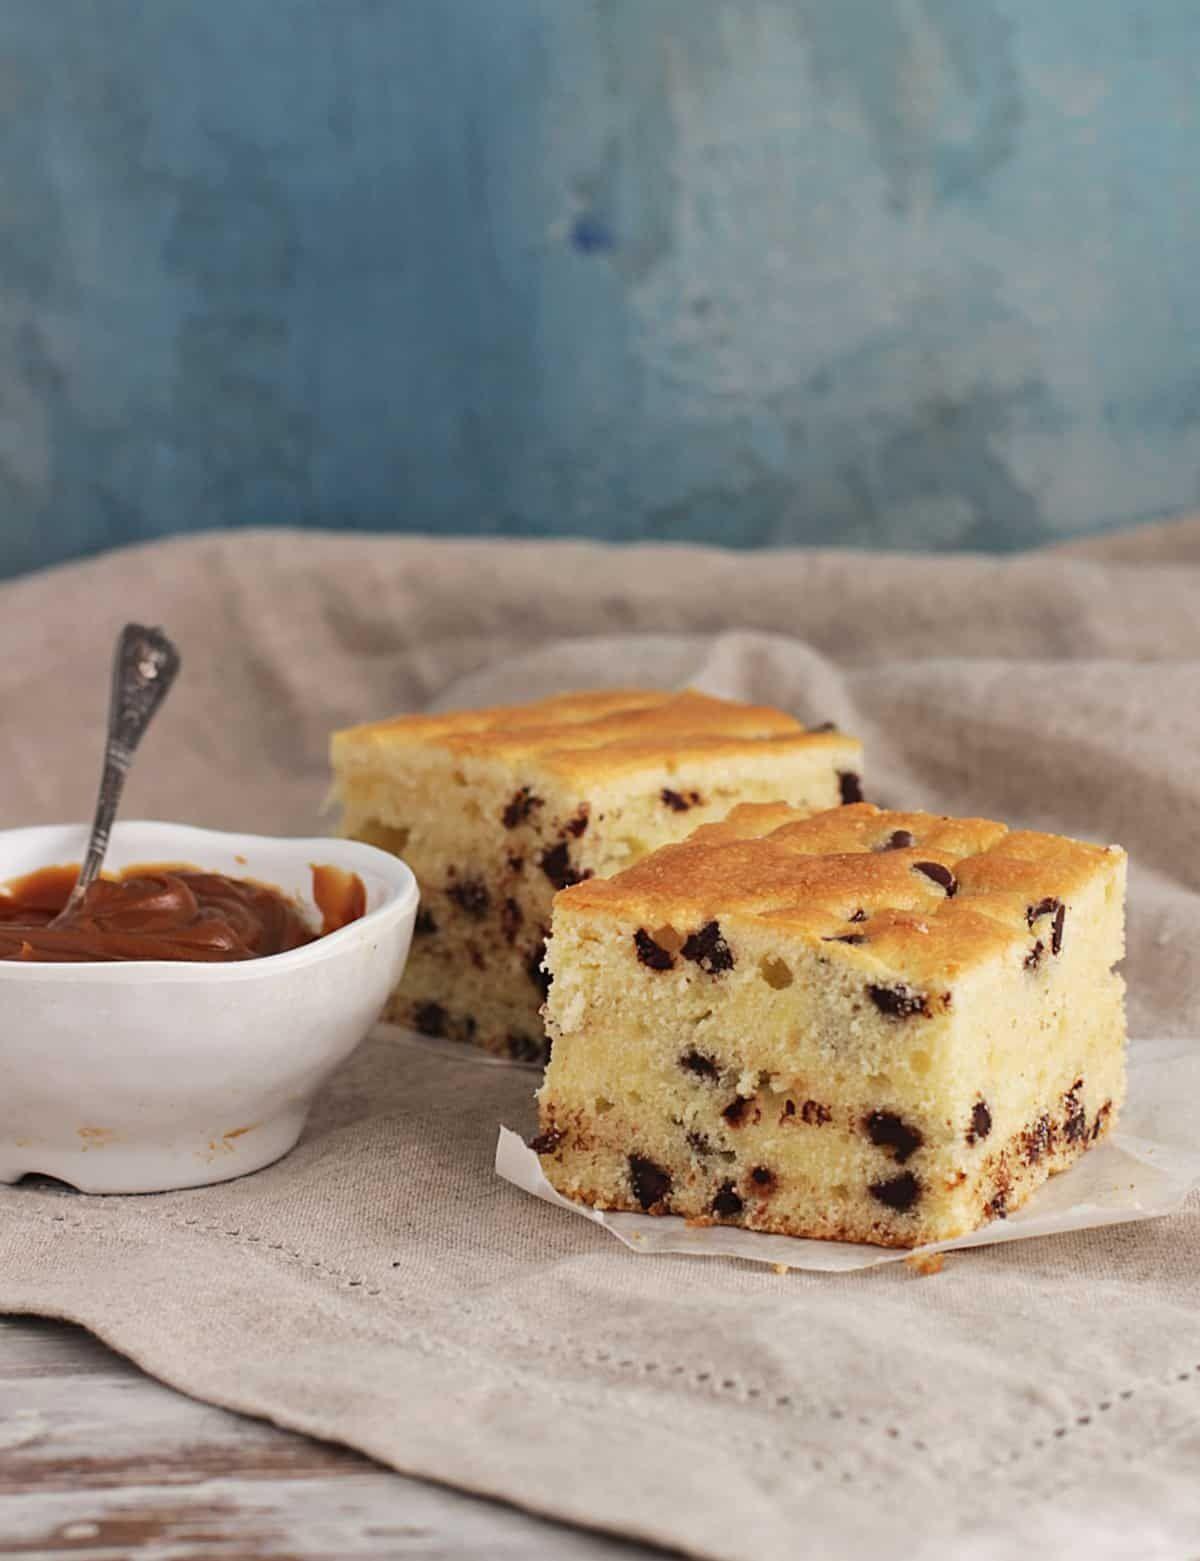 Chocolate Chip Pound Cake With Sour Cream Chocolate Chip Pound Cake Sour Cream Cake Chocolate Chip Recipes